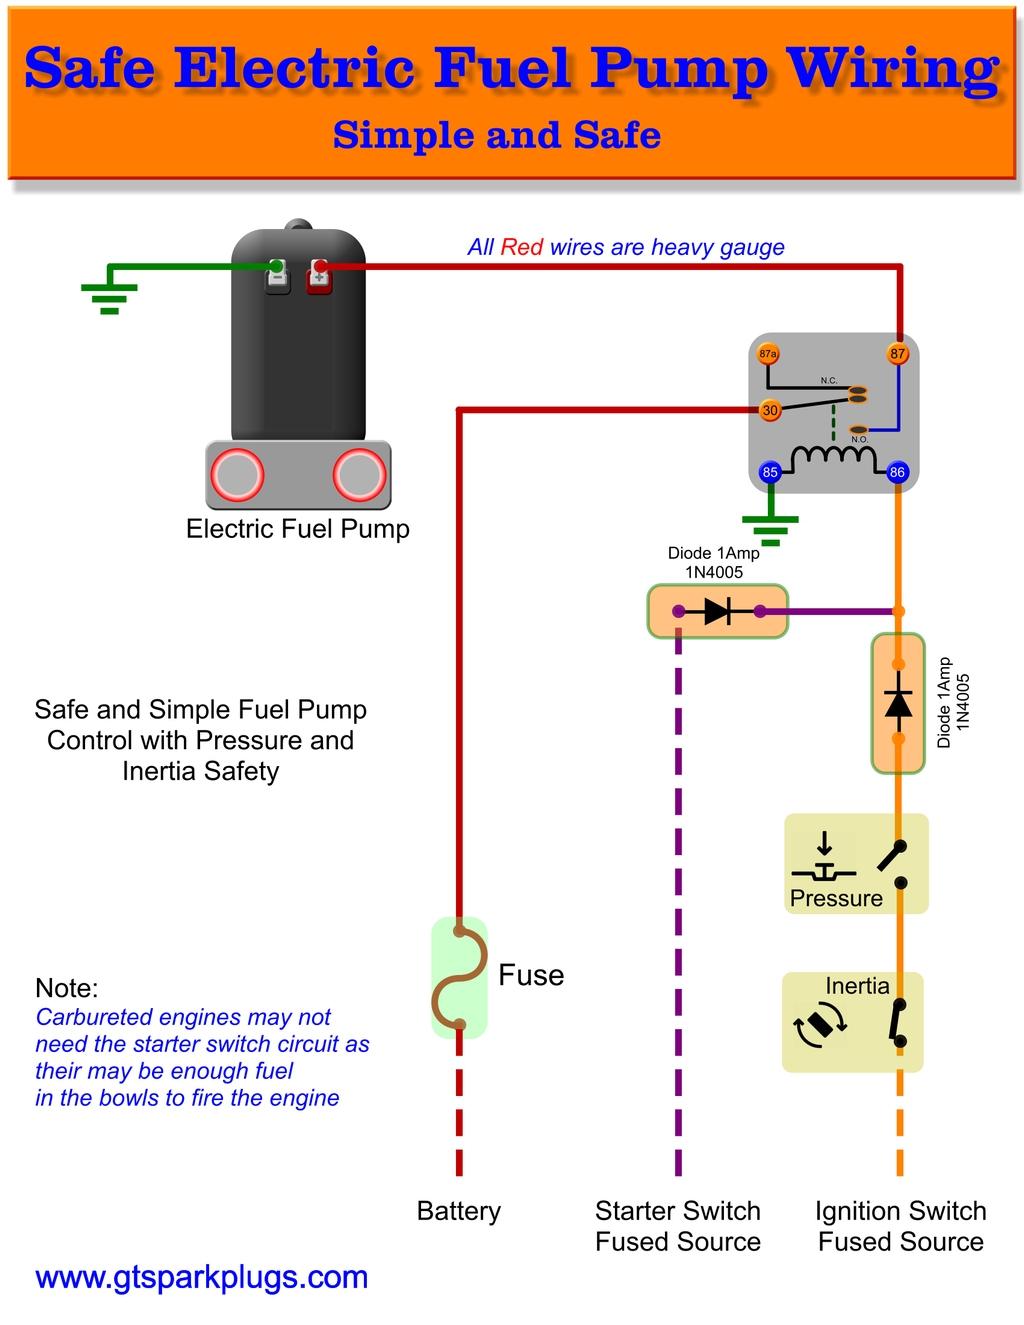 Universal Electric Fuel Pump Wiring Schematic | Wiring Diagram - Universal Fuel Gauge Wiring Diagram